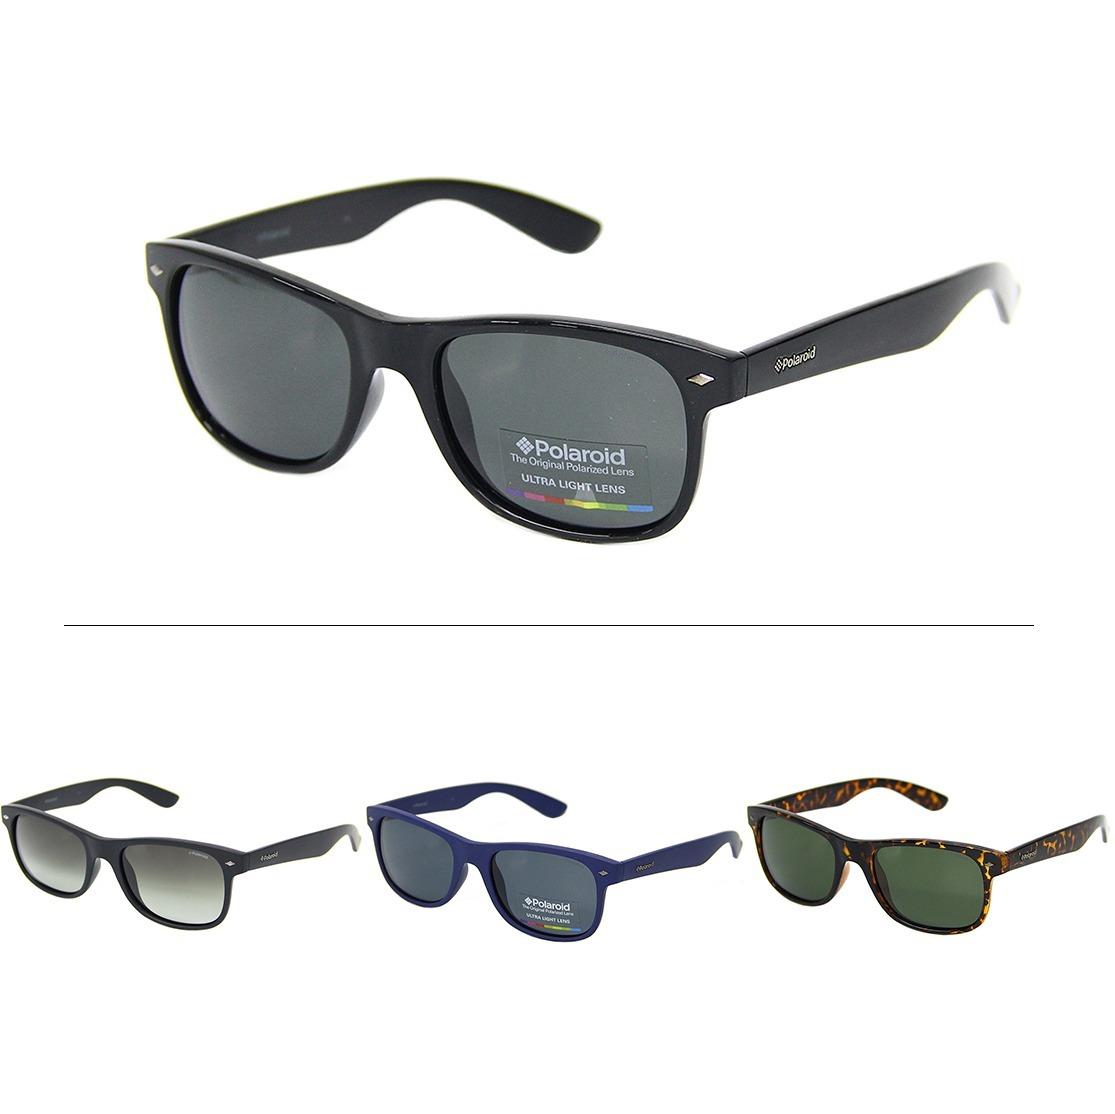 6a580f0a0052c óculos de sol feminino polaroid pld 1015 original. Carregando zoom.